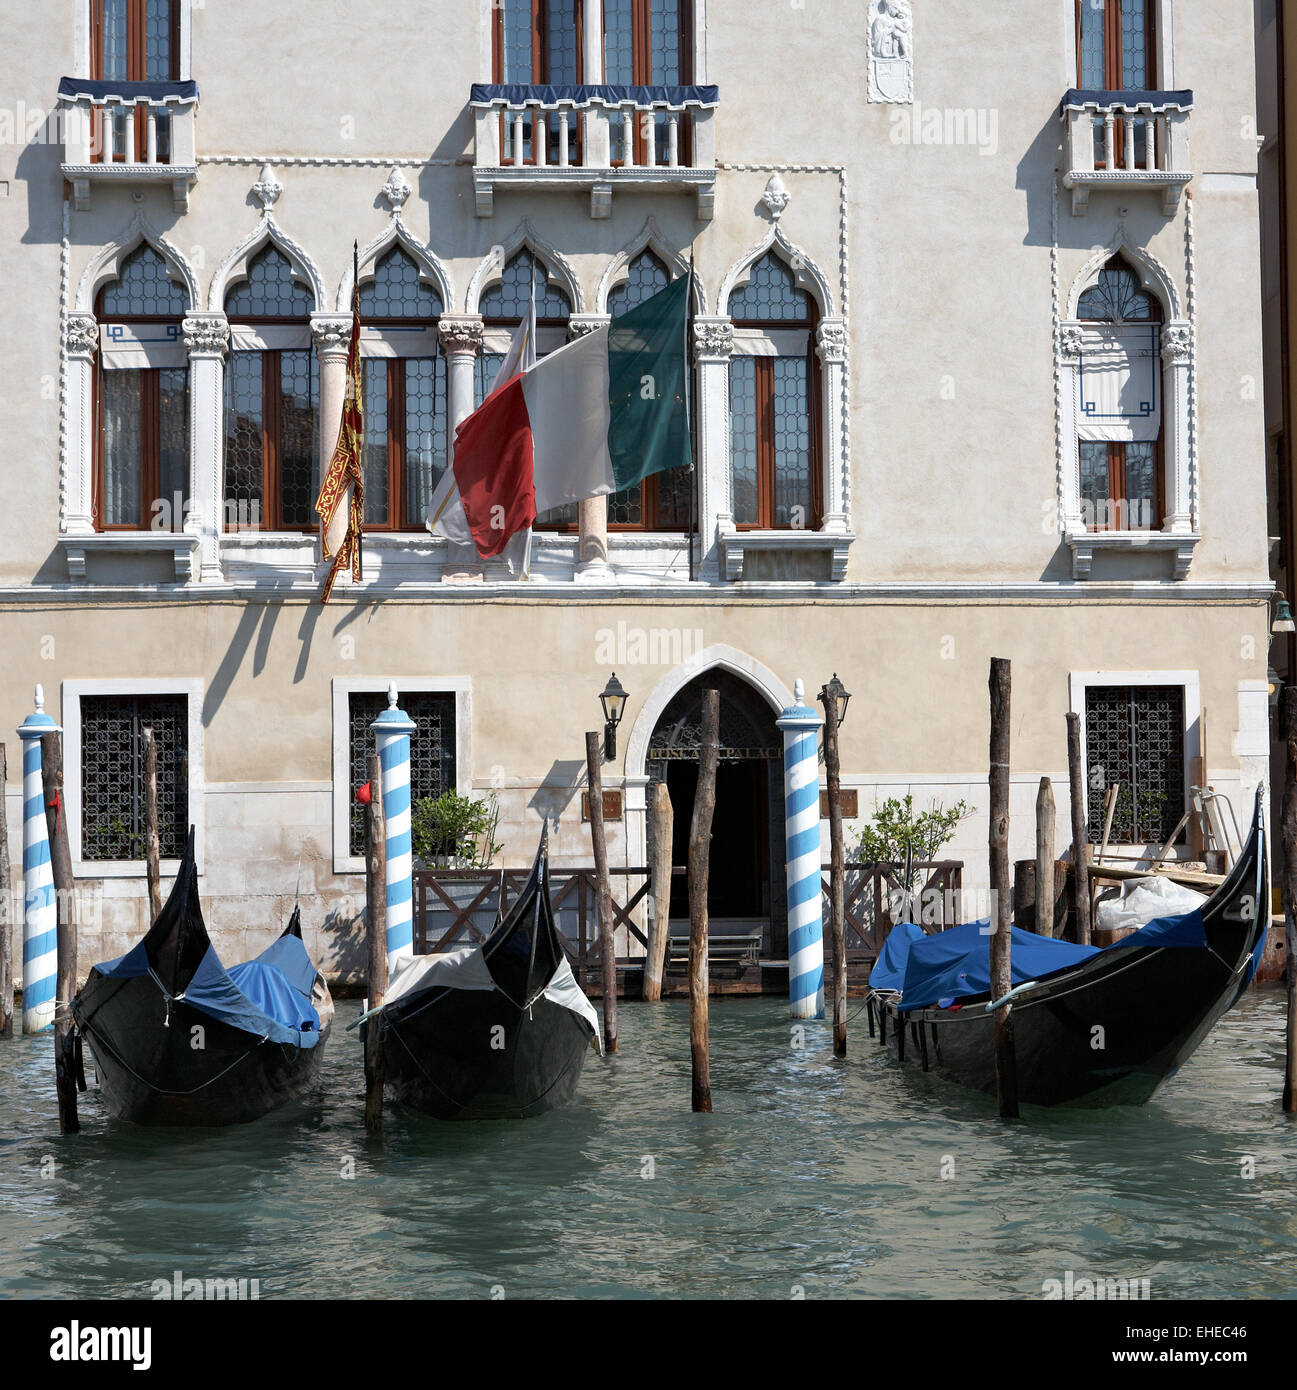 Leben in Venedig - Leben in Venedig Stockbild